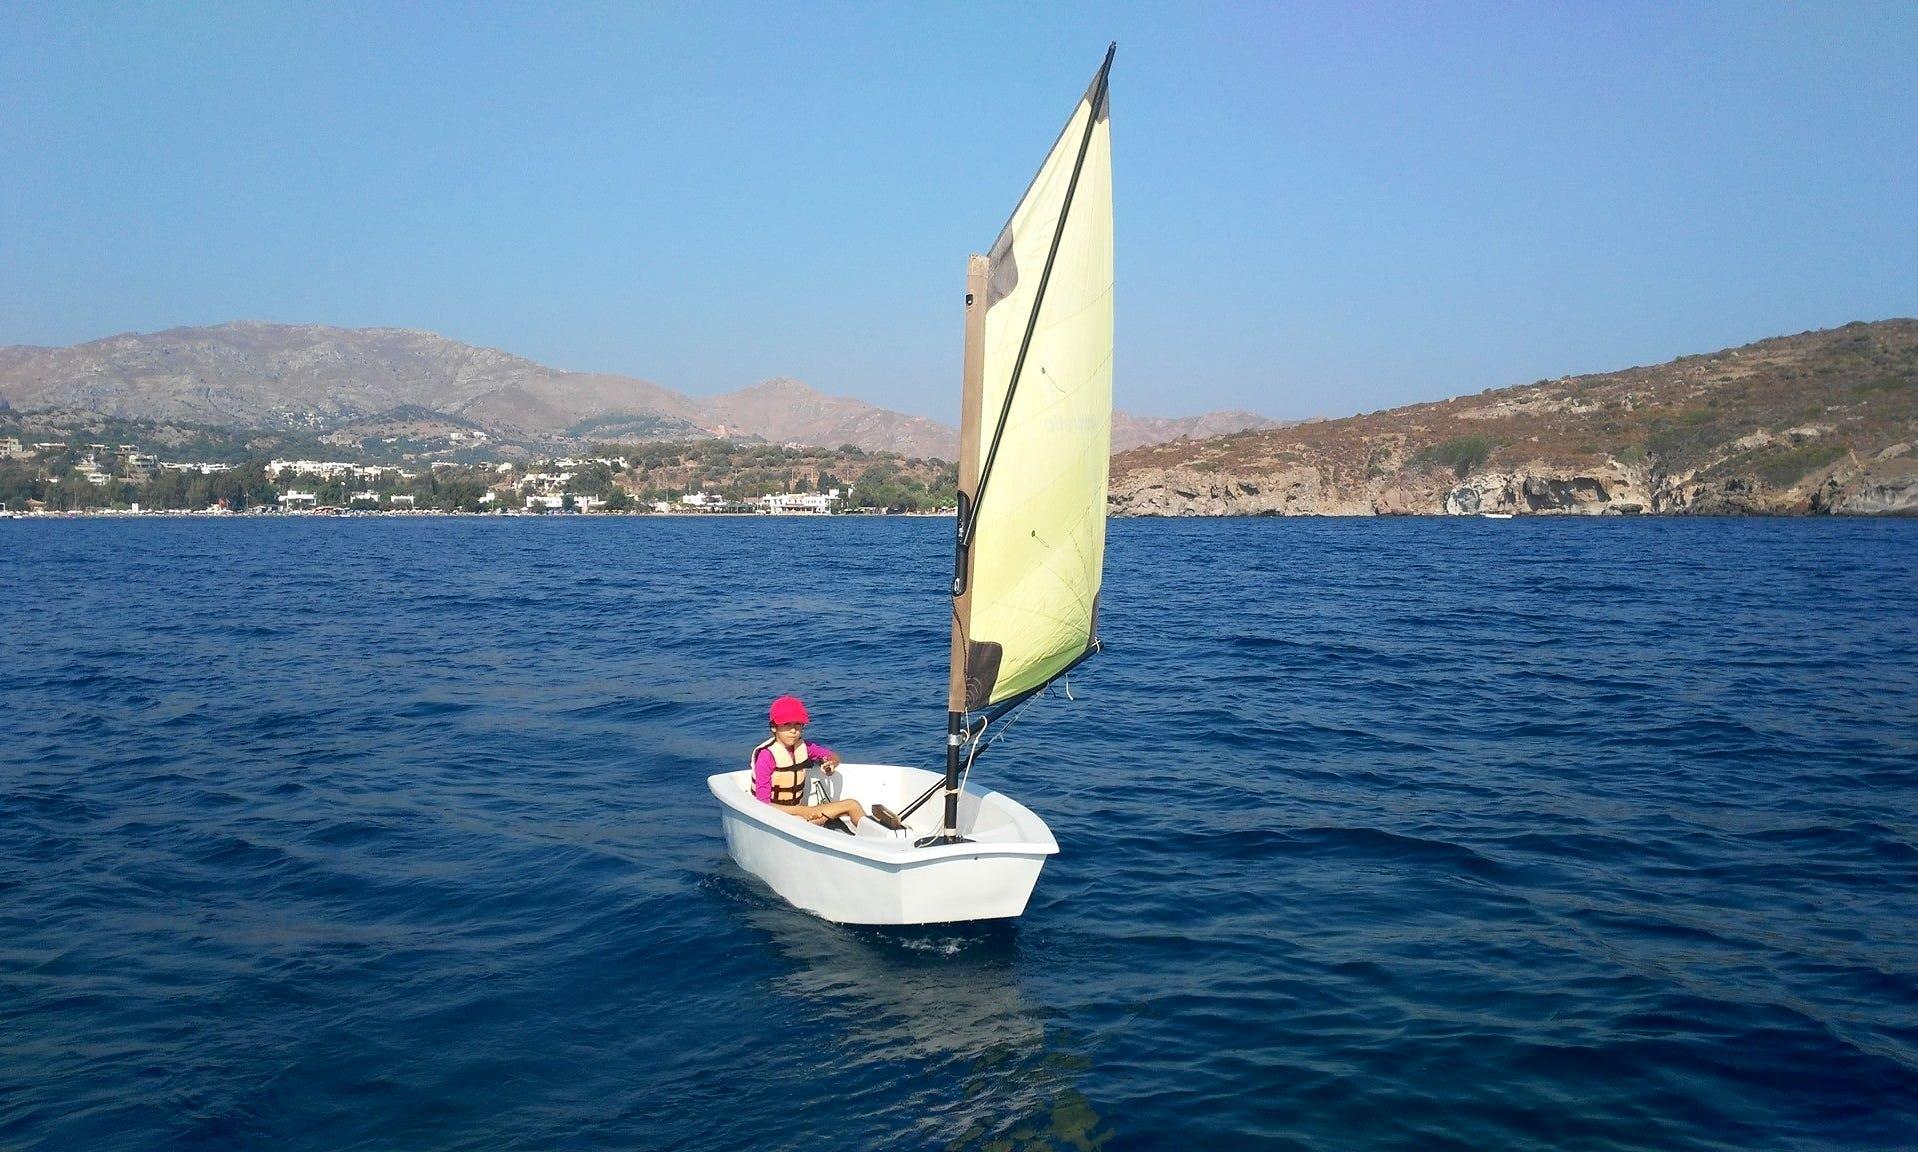 Book The Optimist Sailboat in Muğla, Turkey